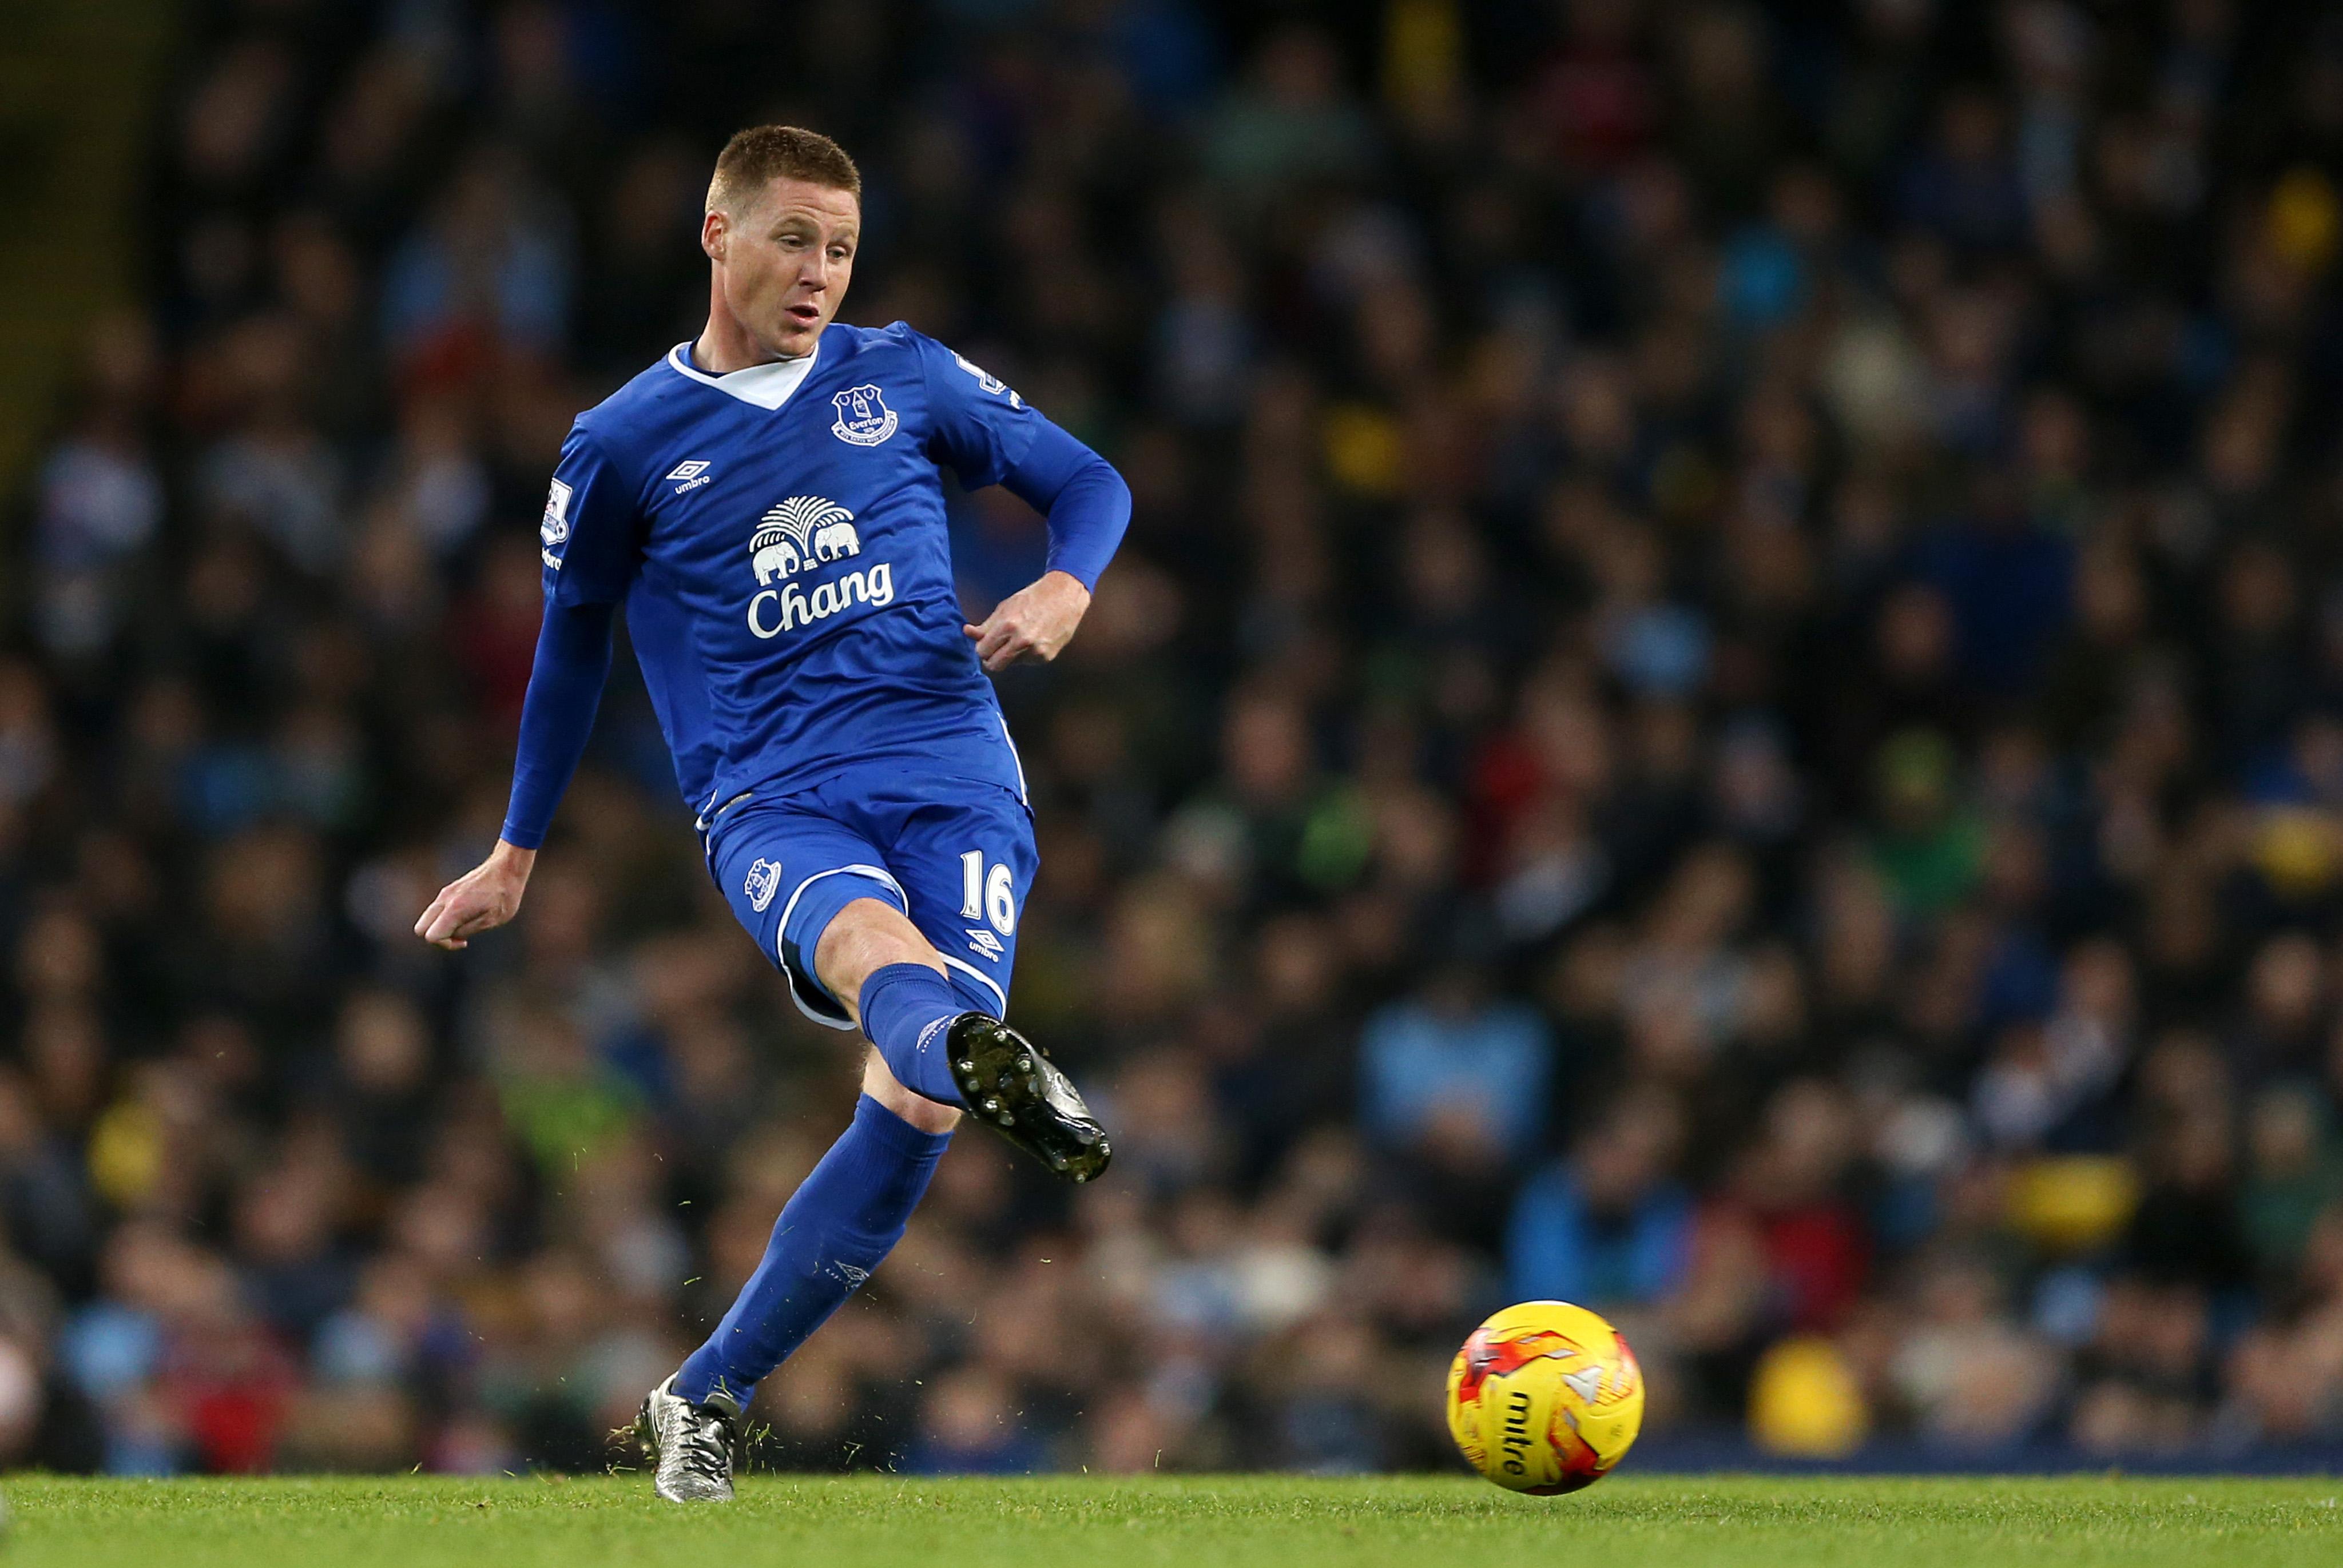 Manchester City v Everton - Capital One Cup - Semi Final - Second Leg - Etihad Stadium